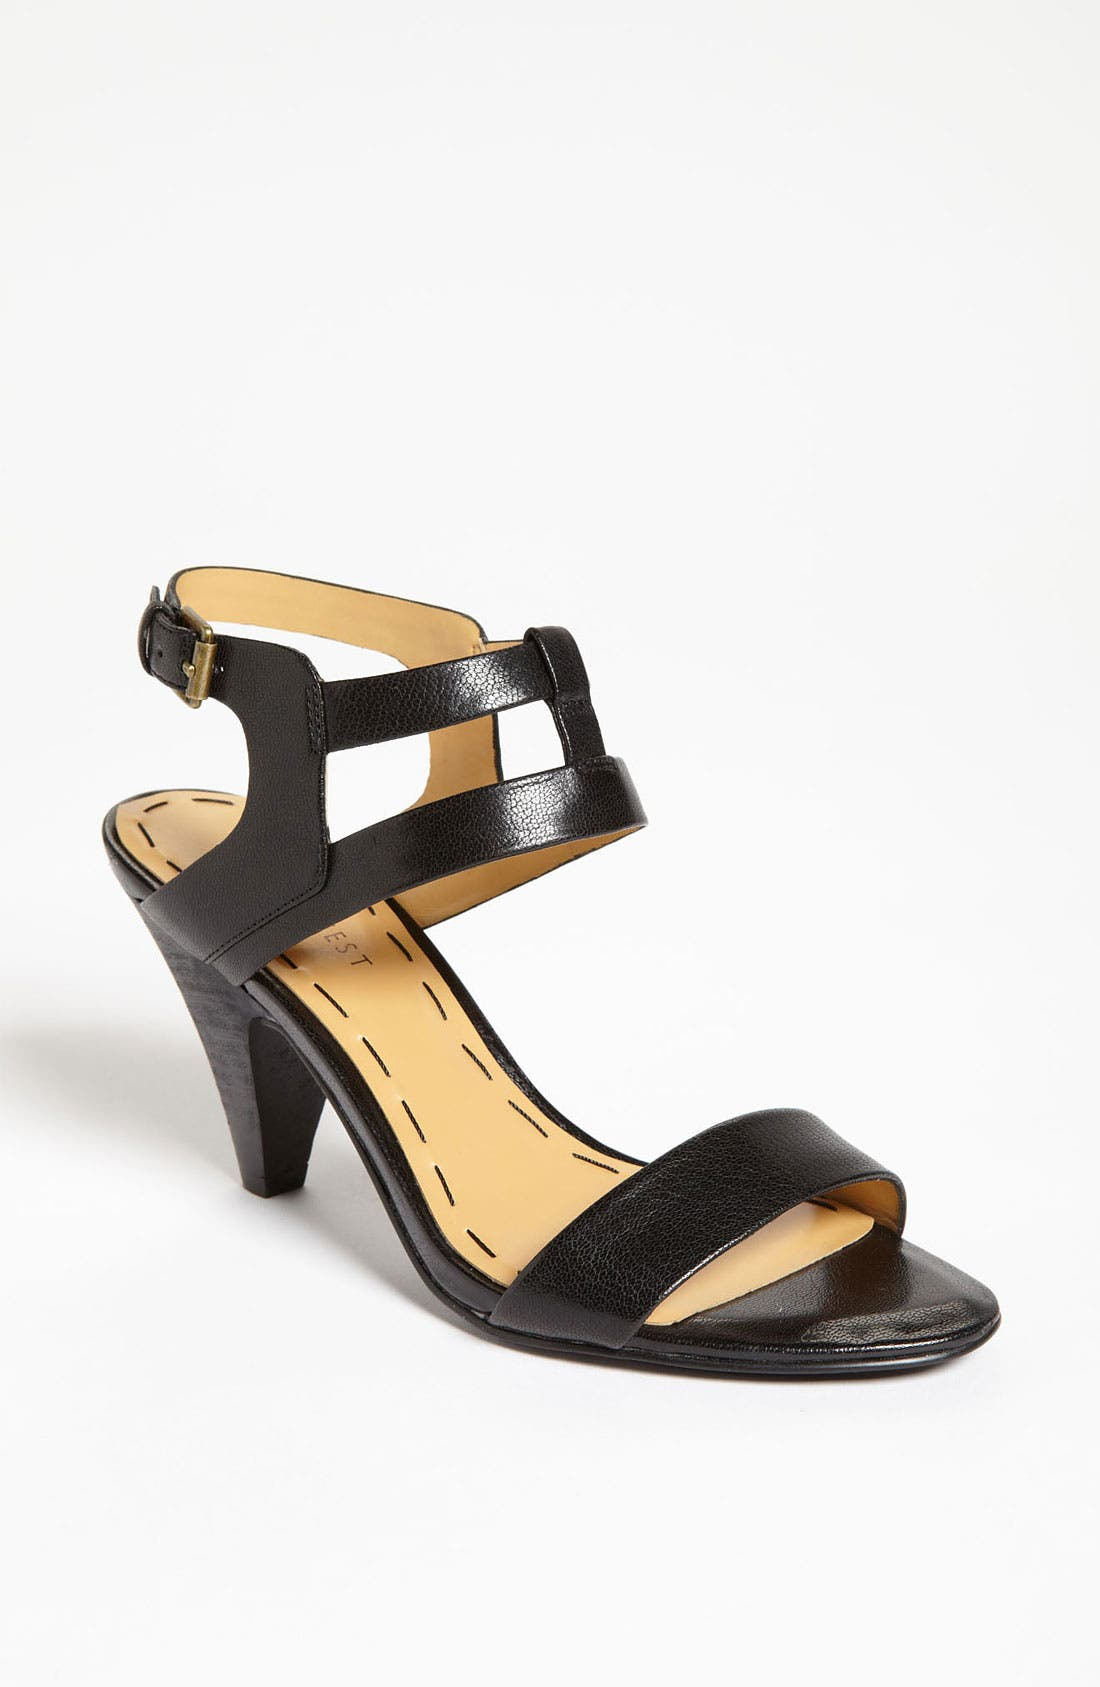 Main Image - Nine West 'Catatude' Sandal